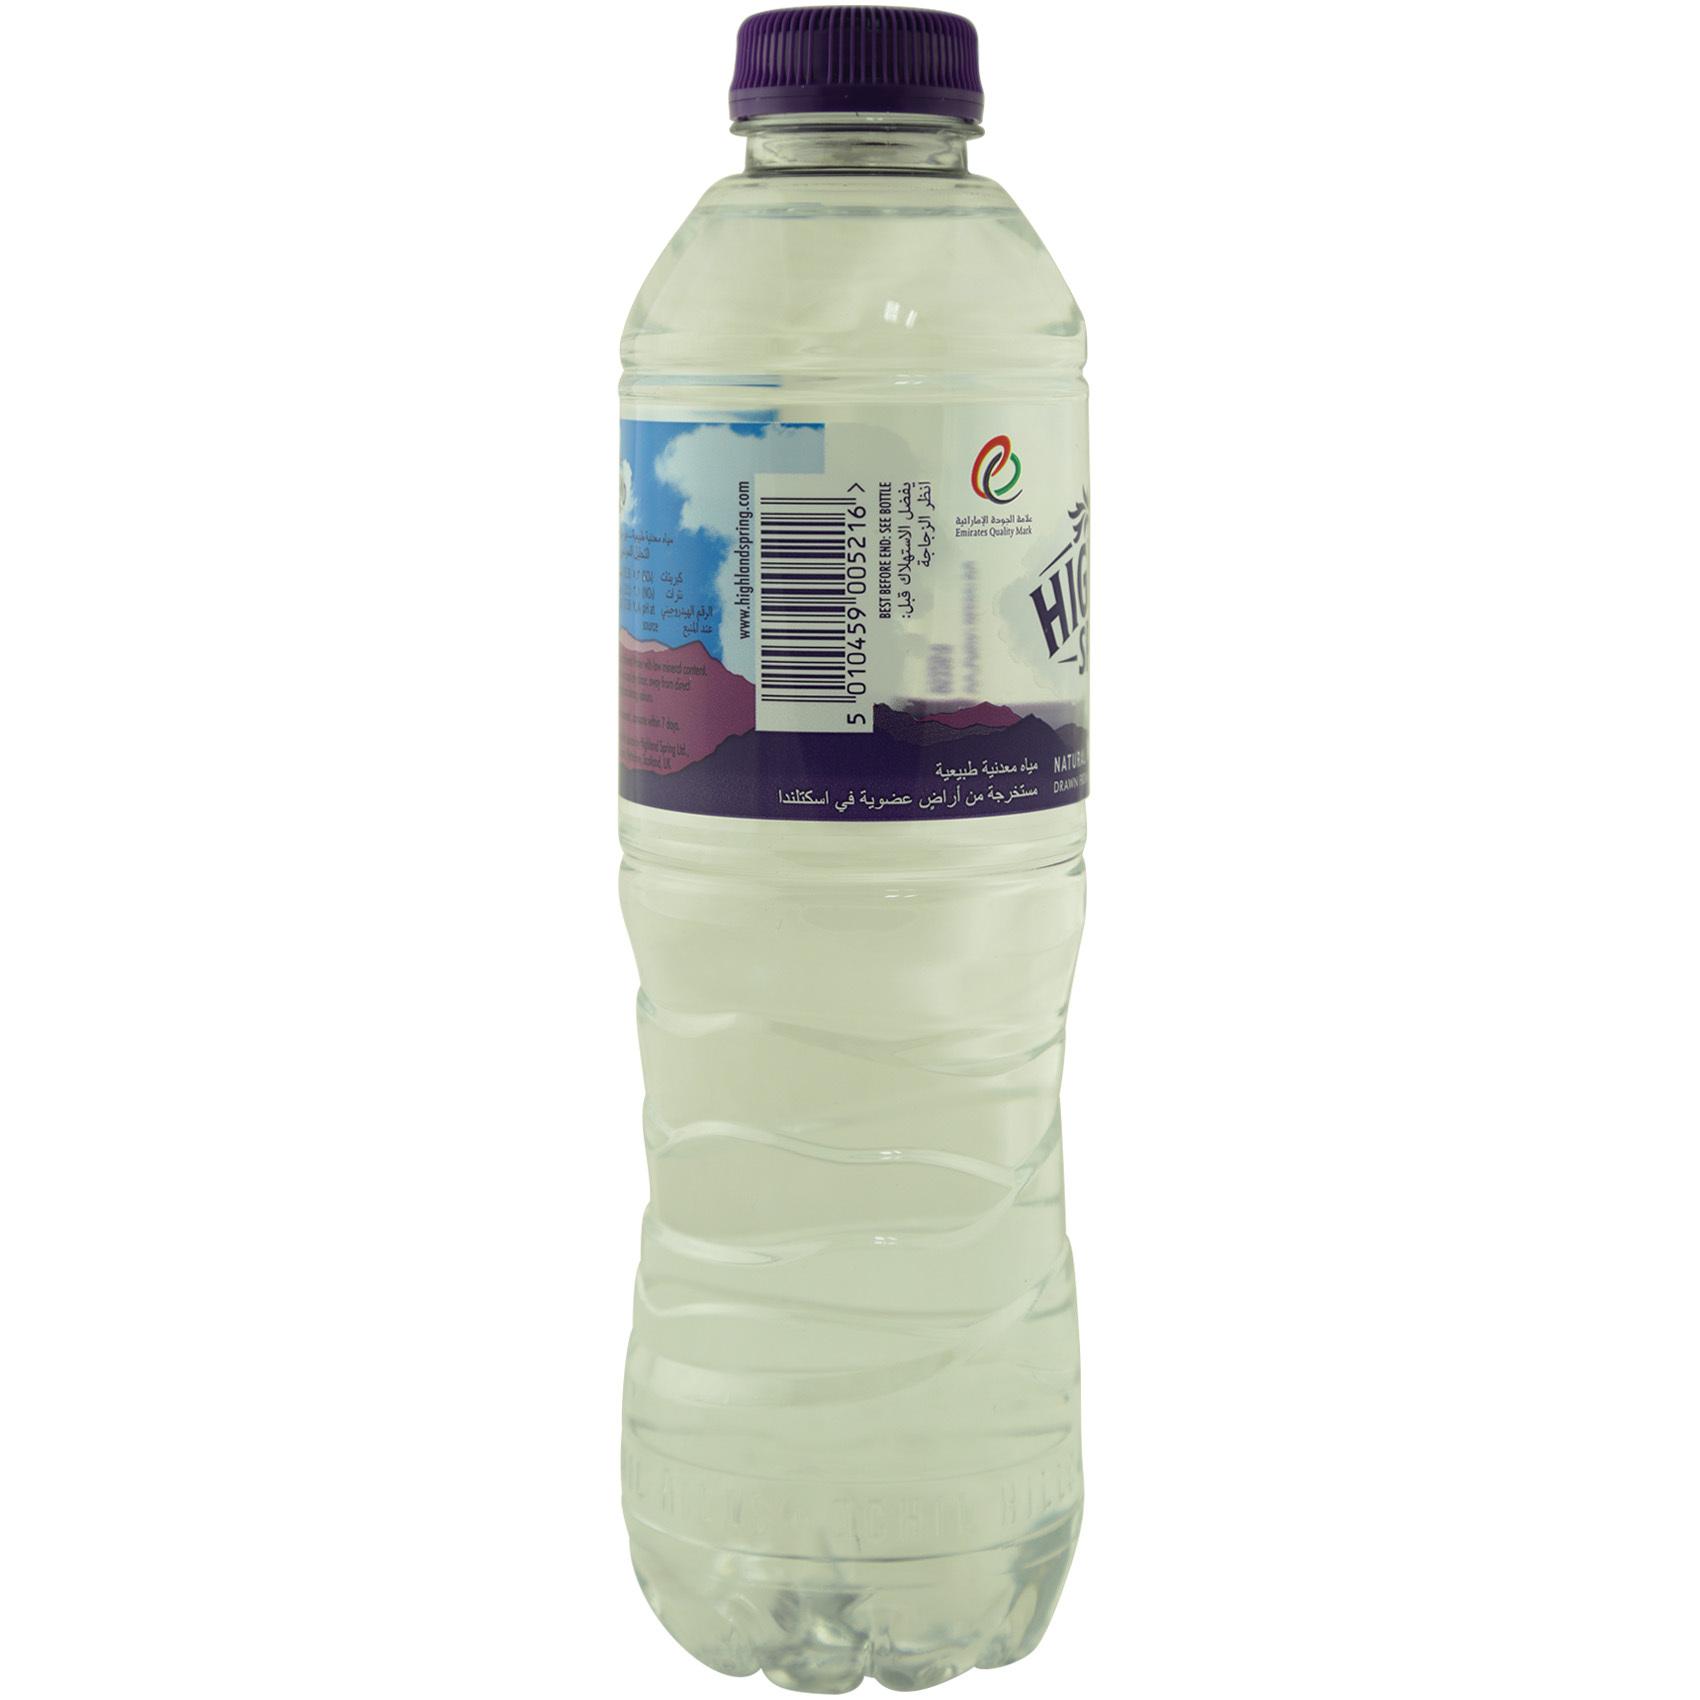 HIGHLAND SPRING WATER 500ML